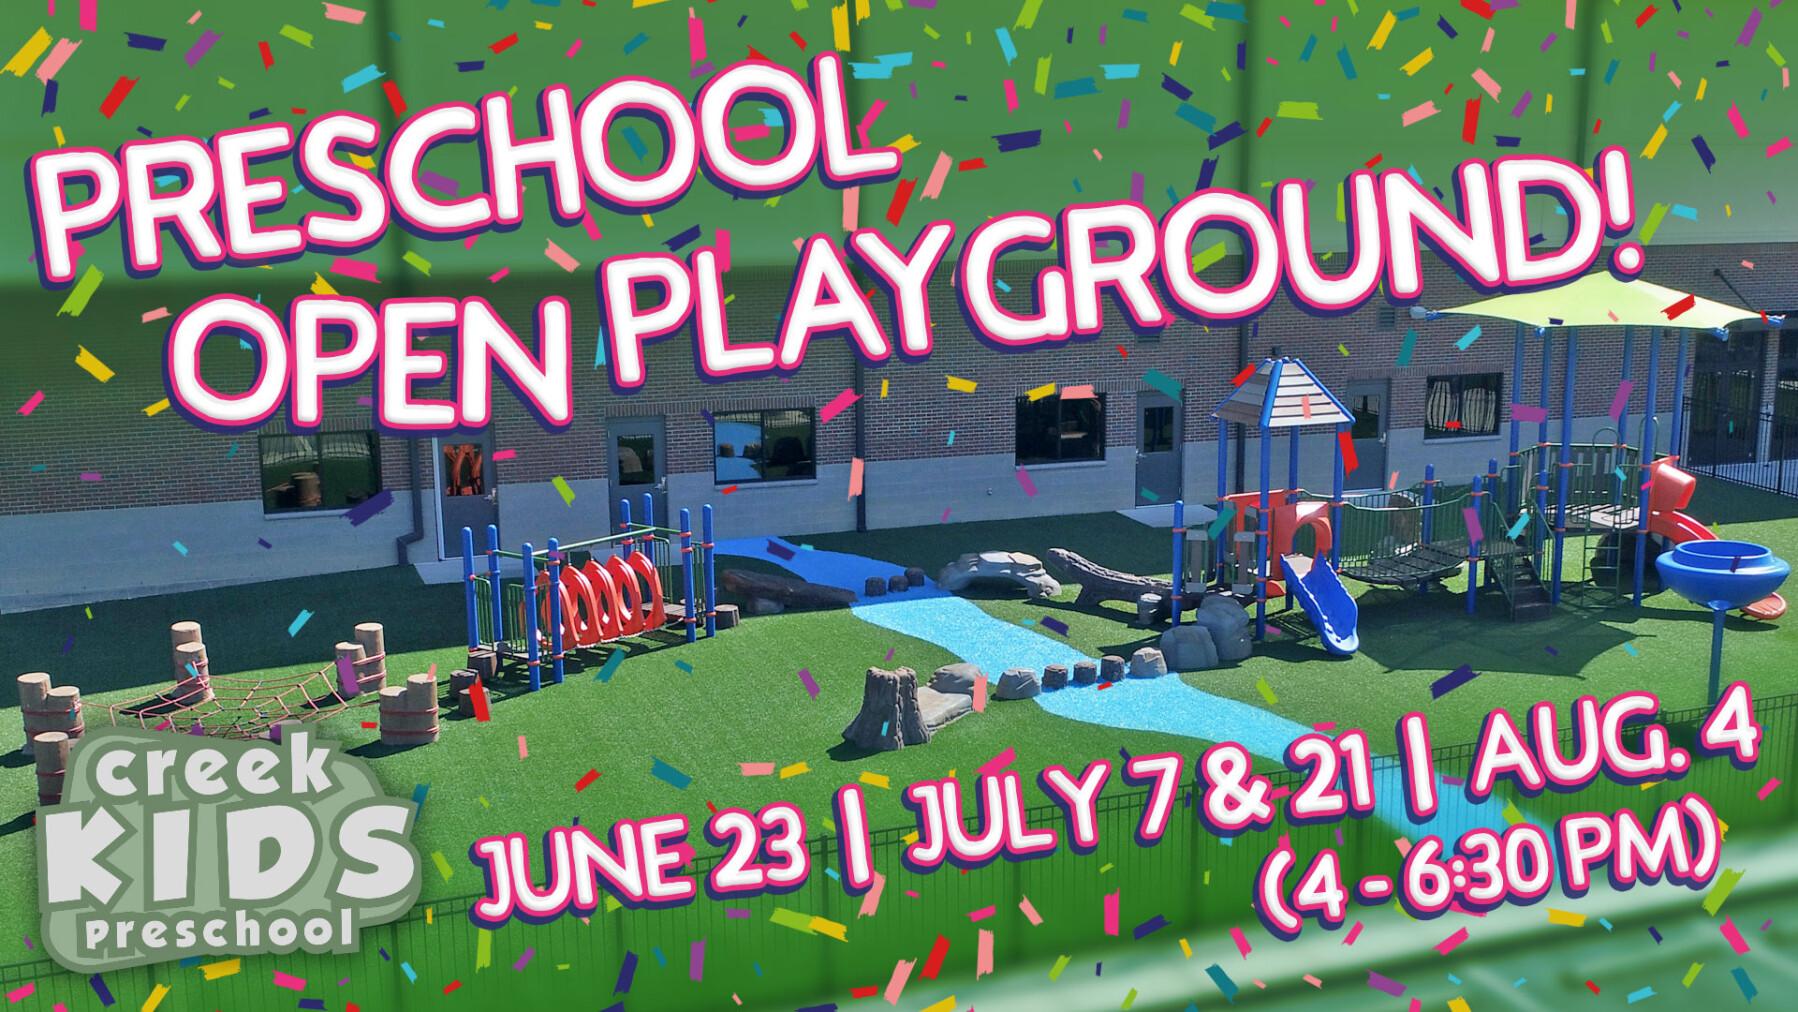 Preschool Open Playground!